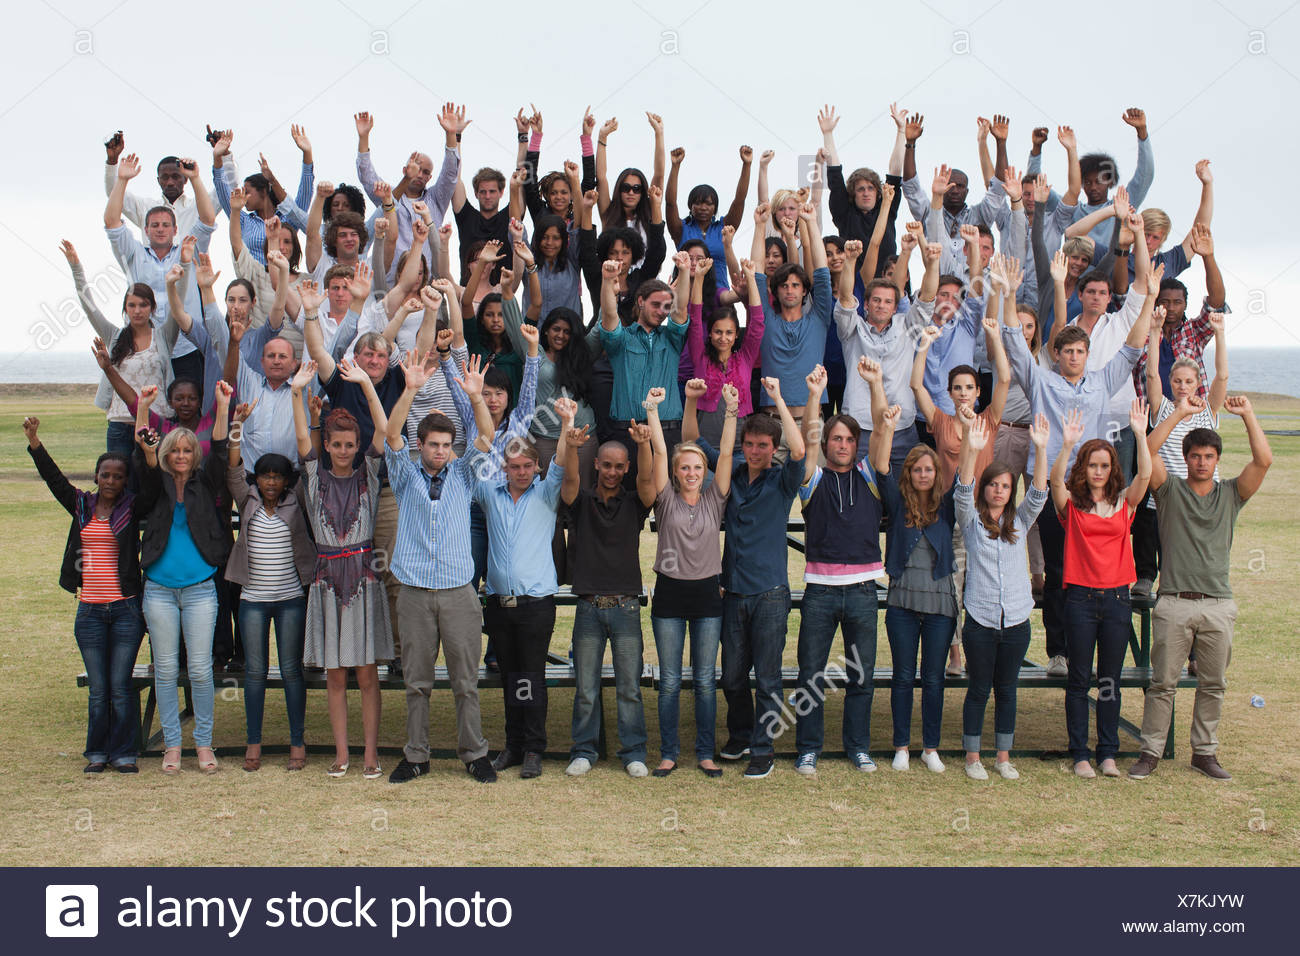 Group of spectators cheering - Stock Image